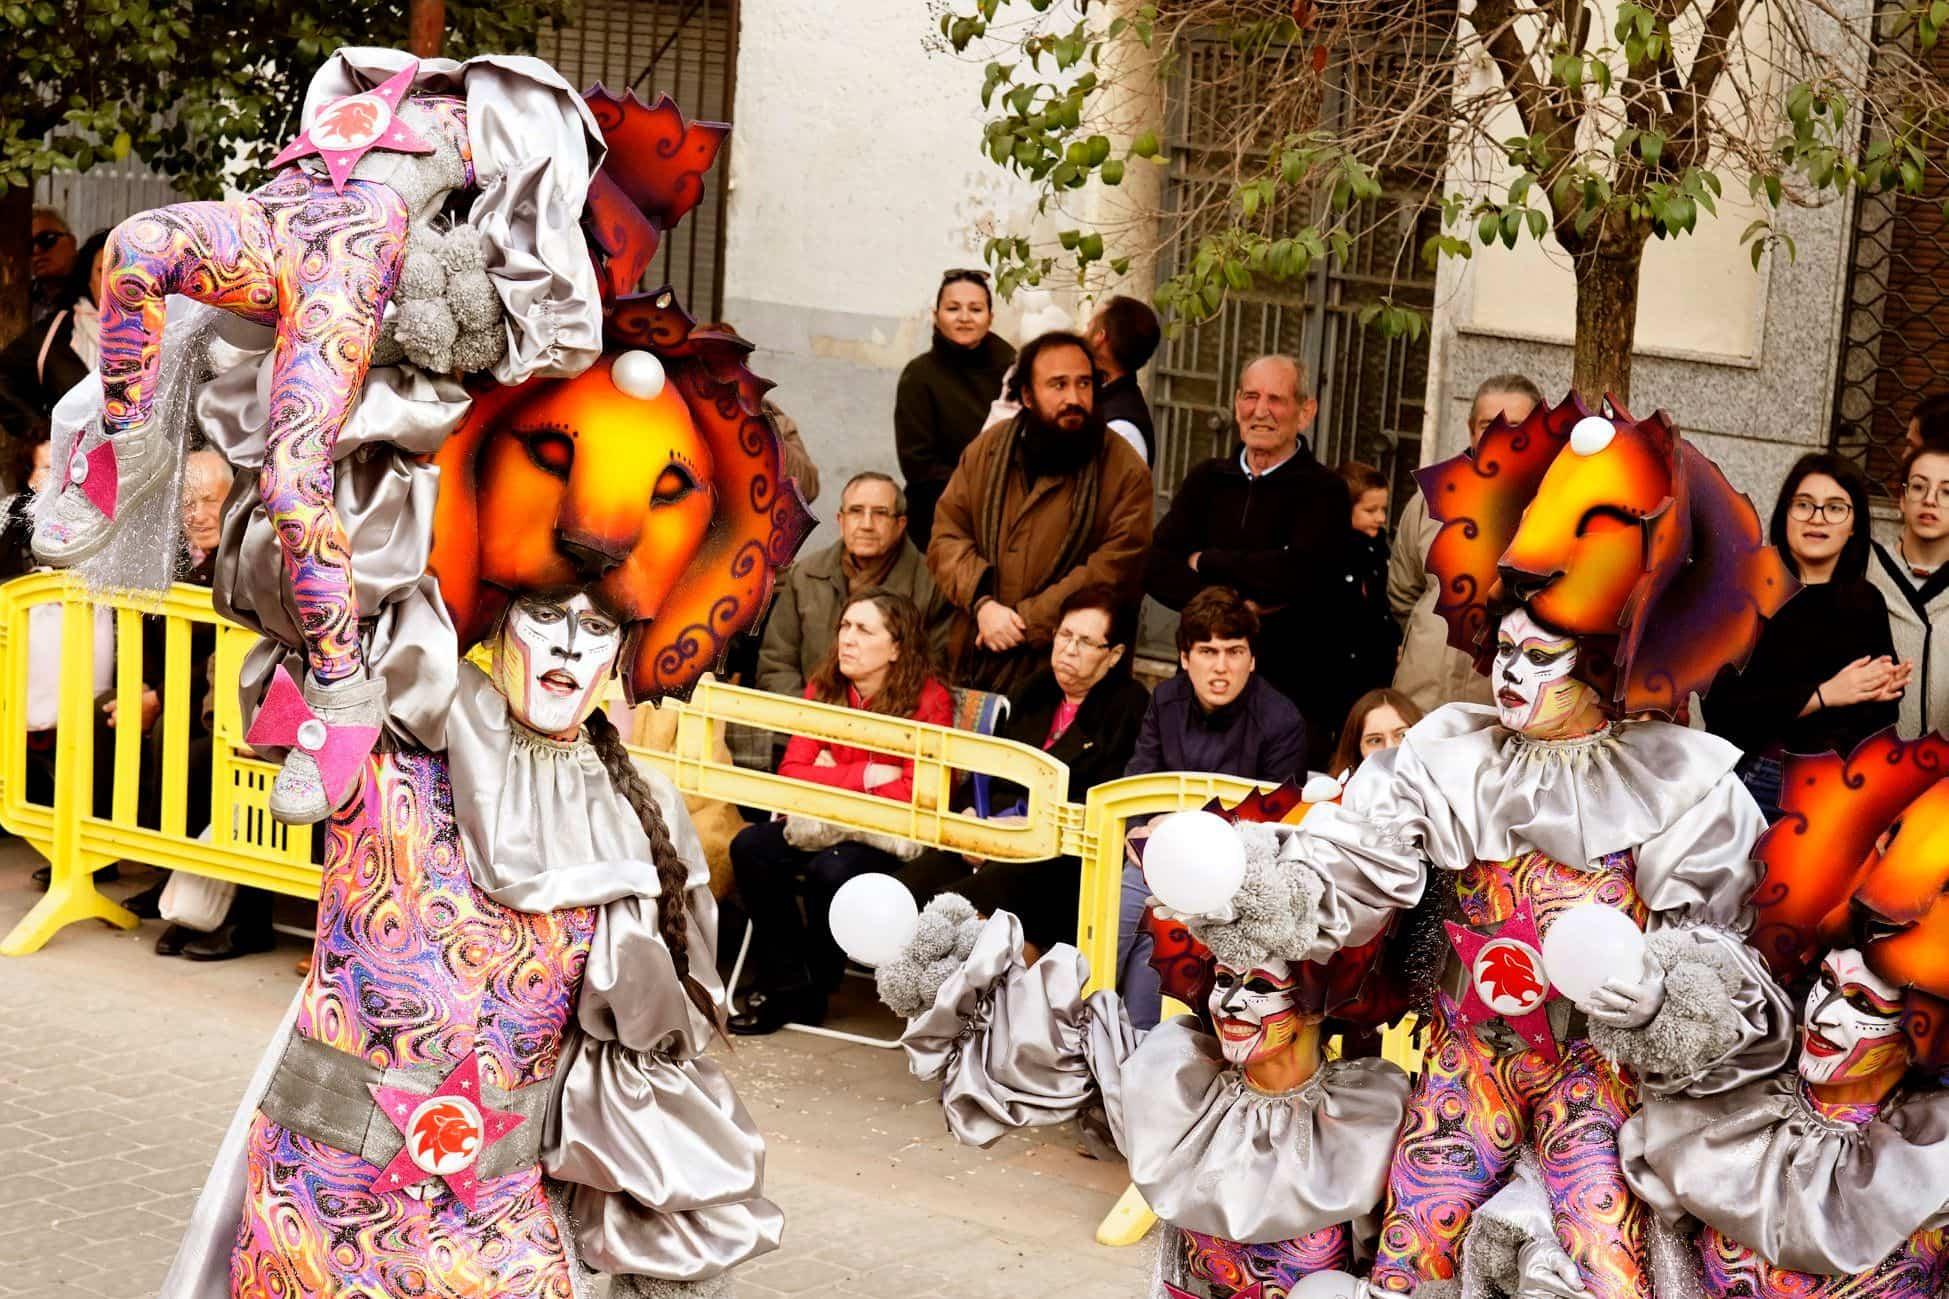 Carnaval de herencia 2020 ofertorio 149 - Selección de fotografías del Ofertorio del Carnaval de Herencia